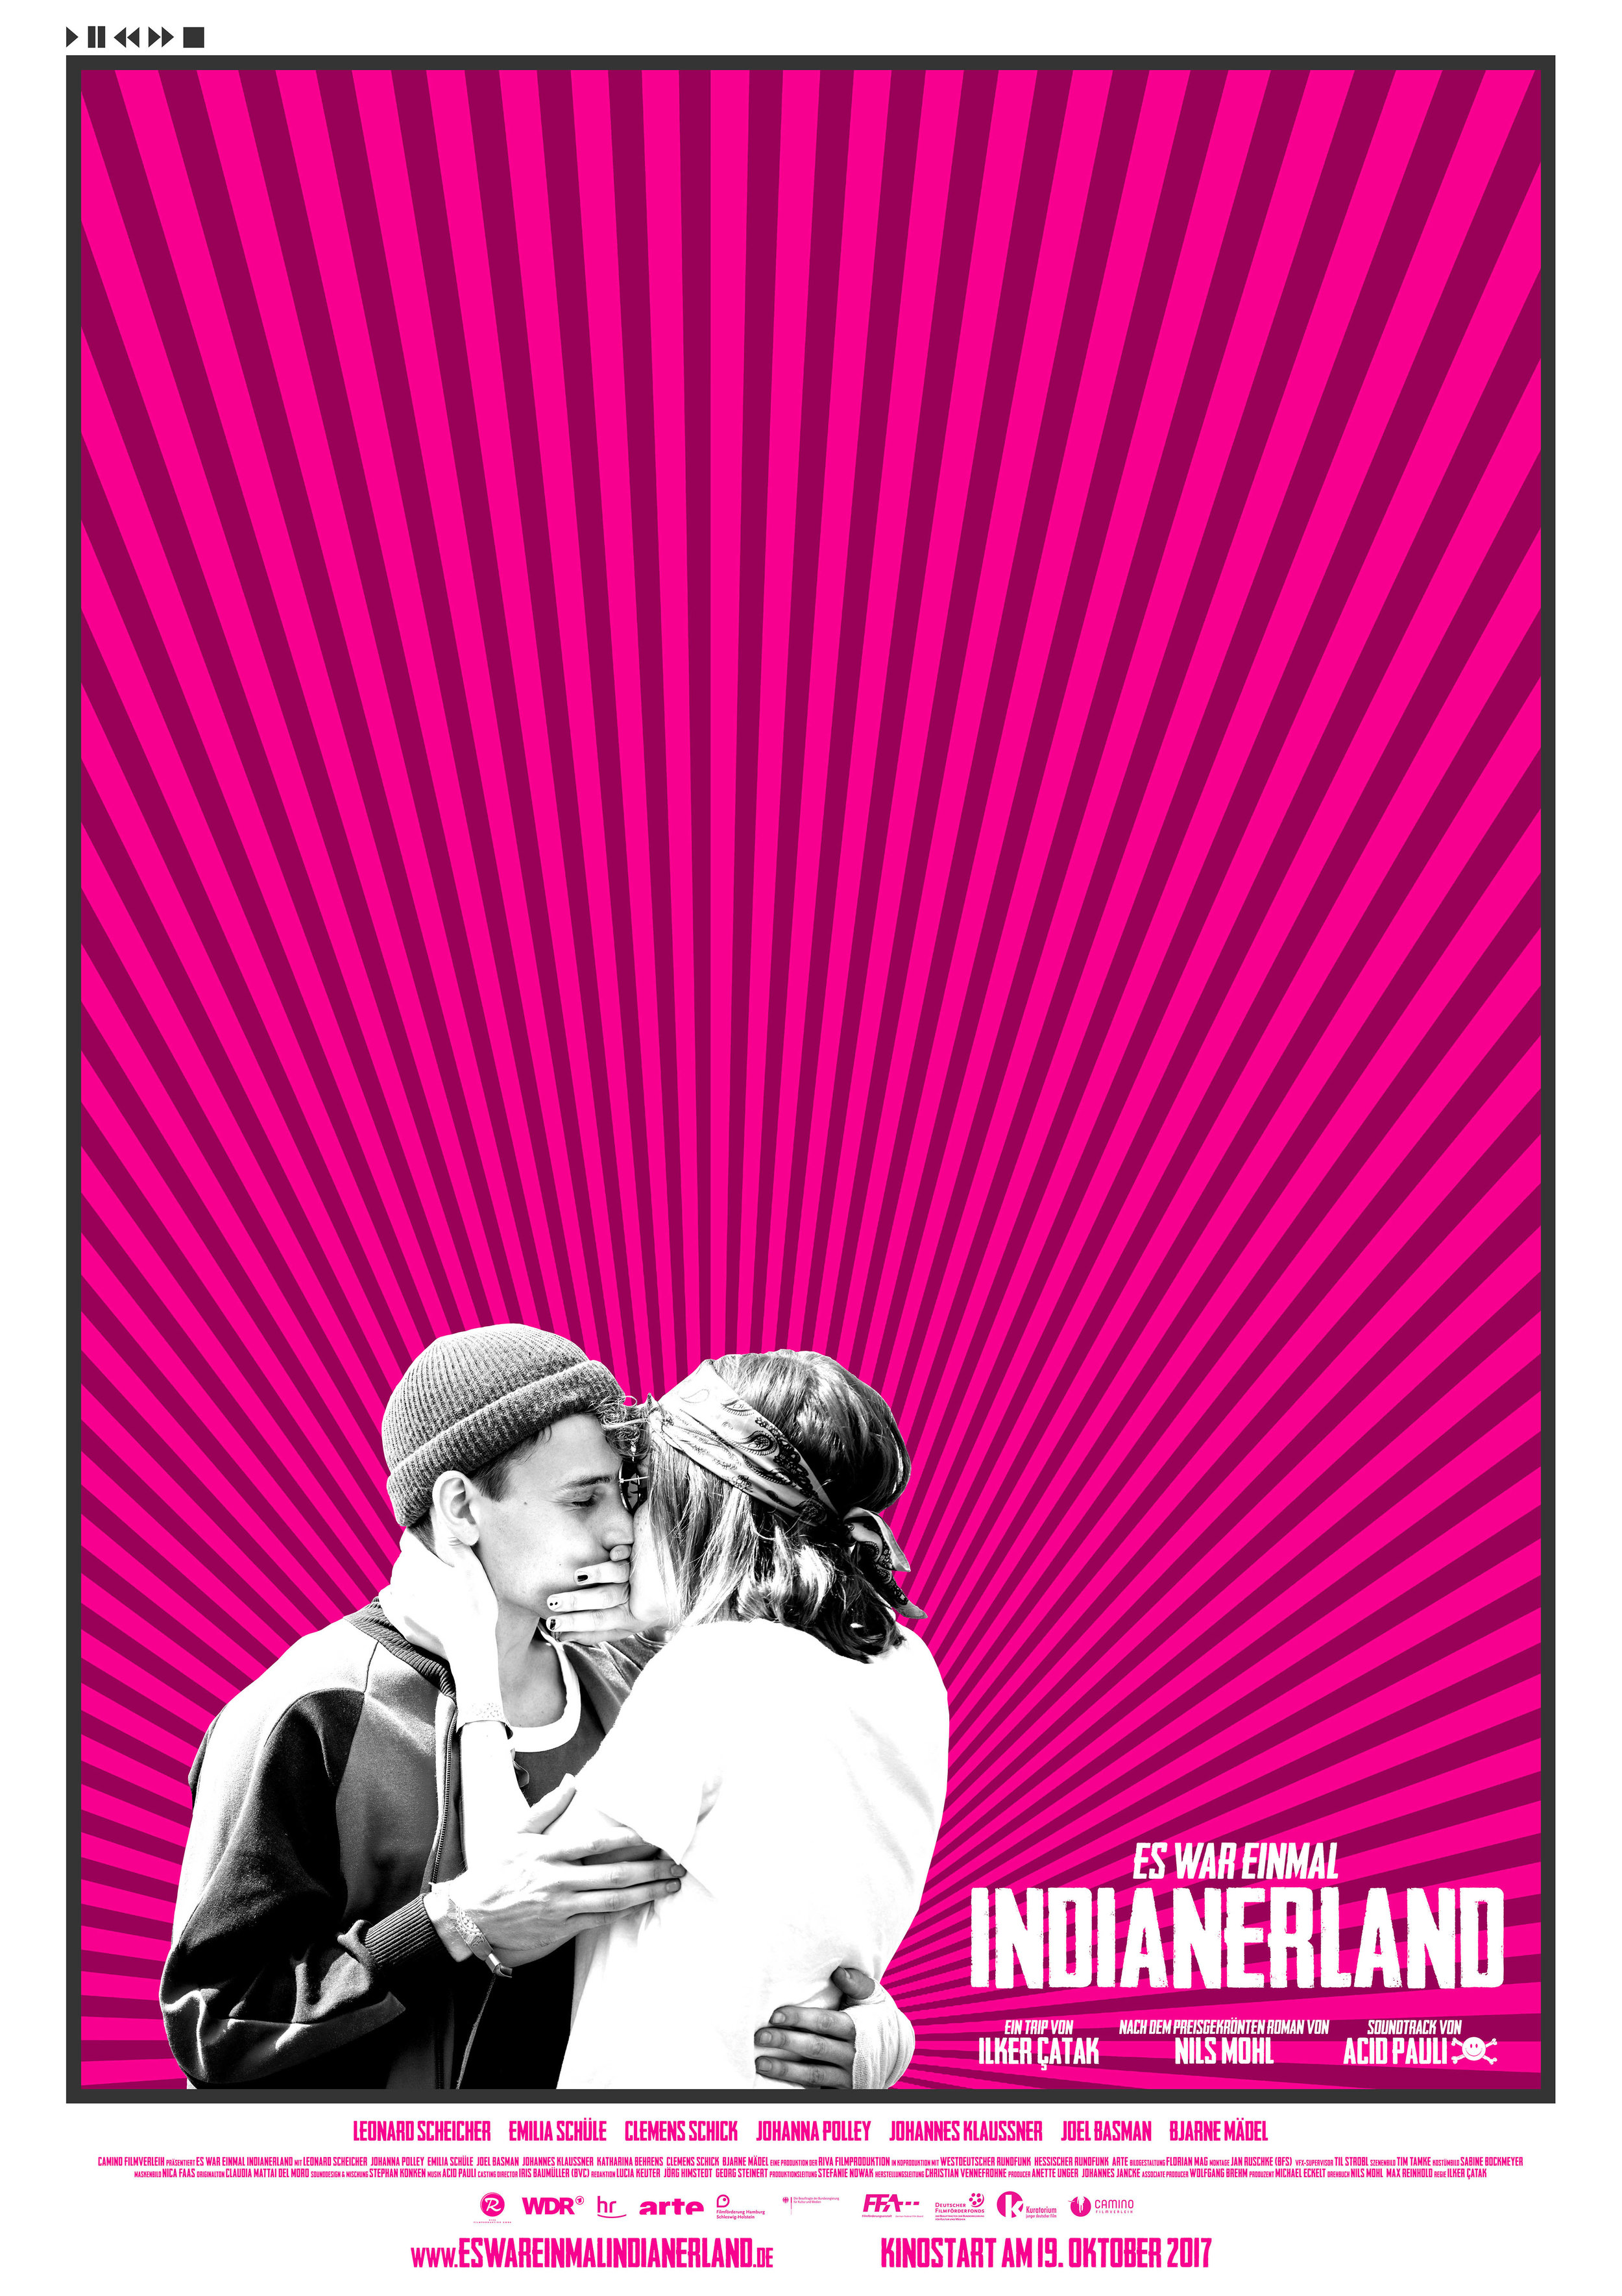 indianerland_300dpi_pink_poster.jpg